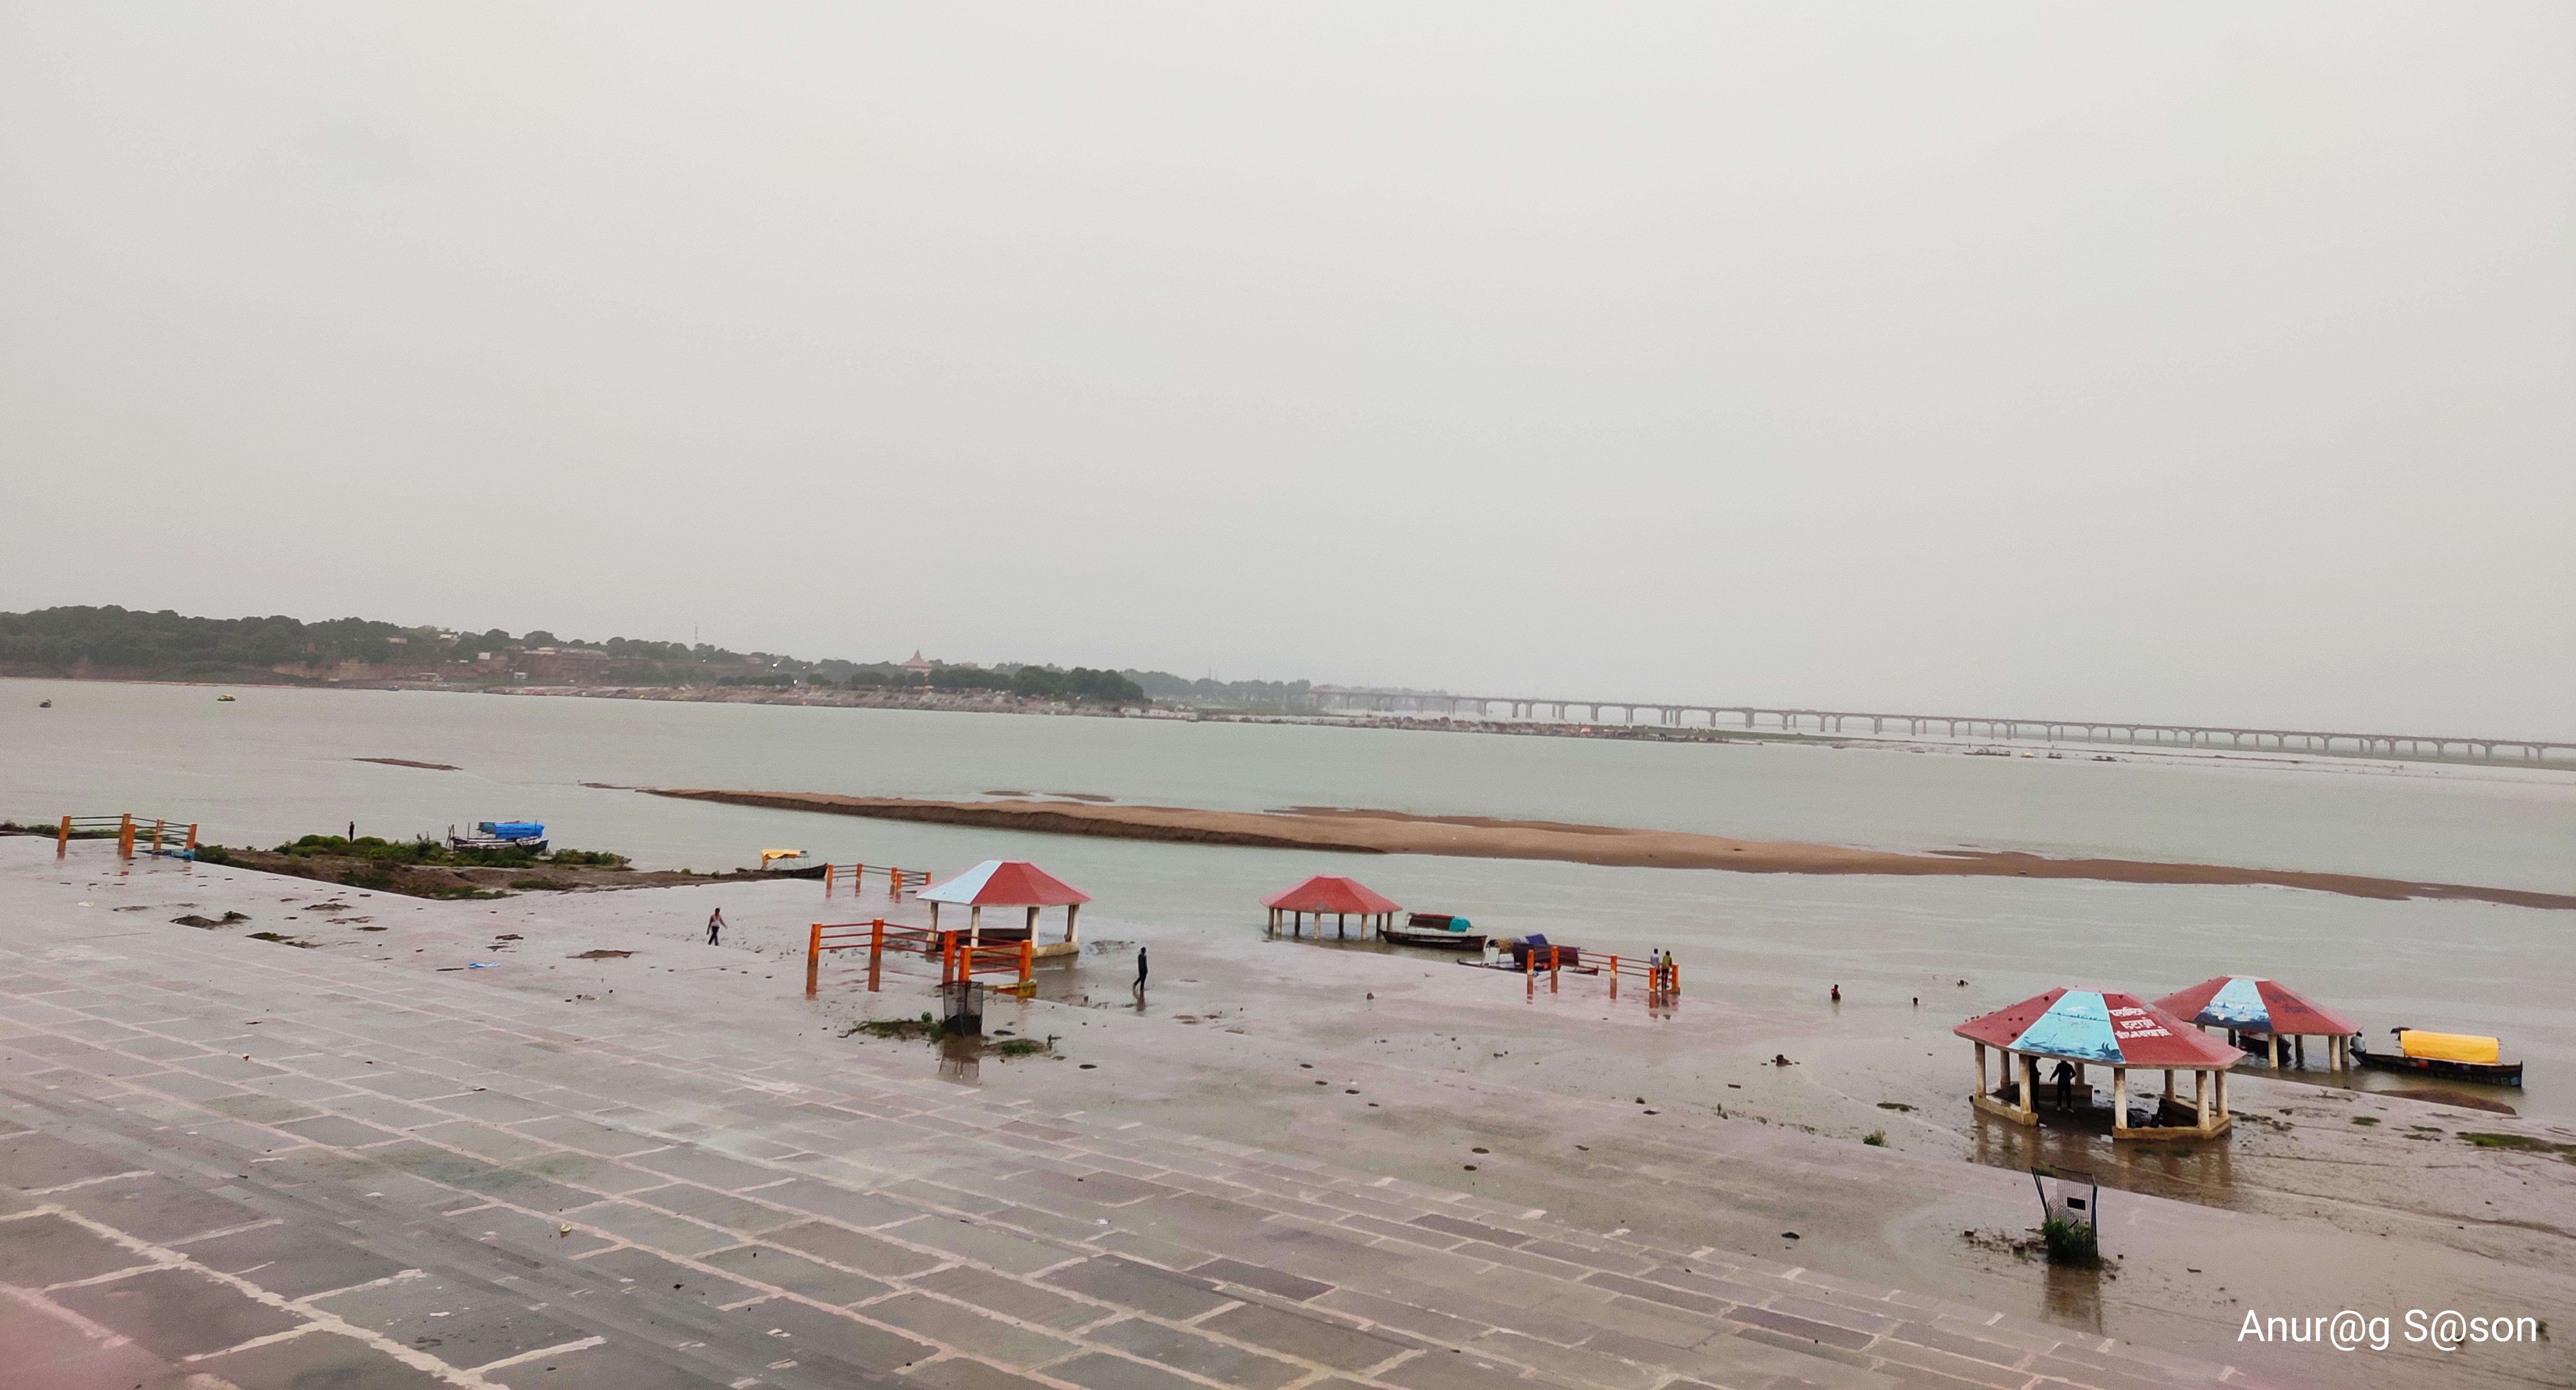 Pic of the day, Triveni Sangam, monsoon, Anurag Sason